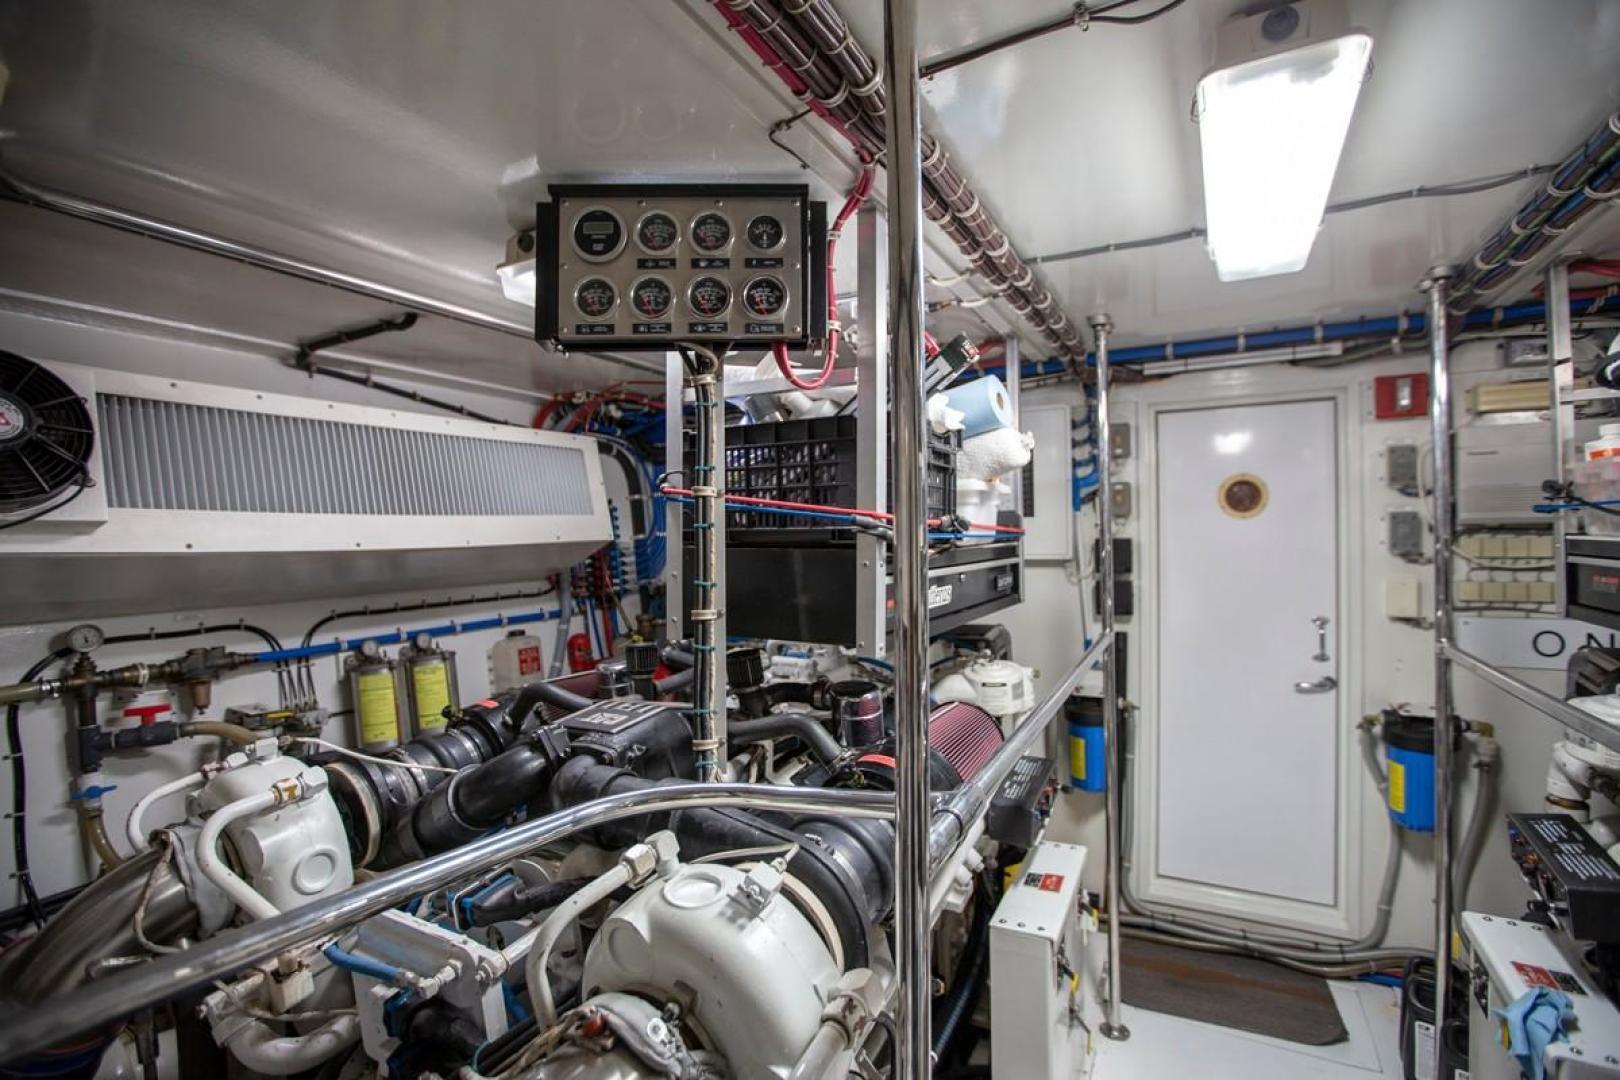 Hatteras-Cockpit Motor Yacht 2000-Getaway Ft. Lauderdale-Florida-United States-977384 | Thumbnail